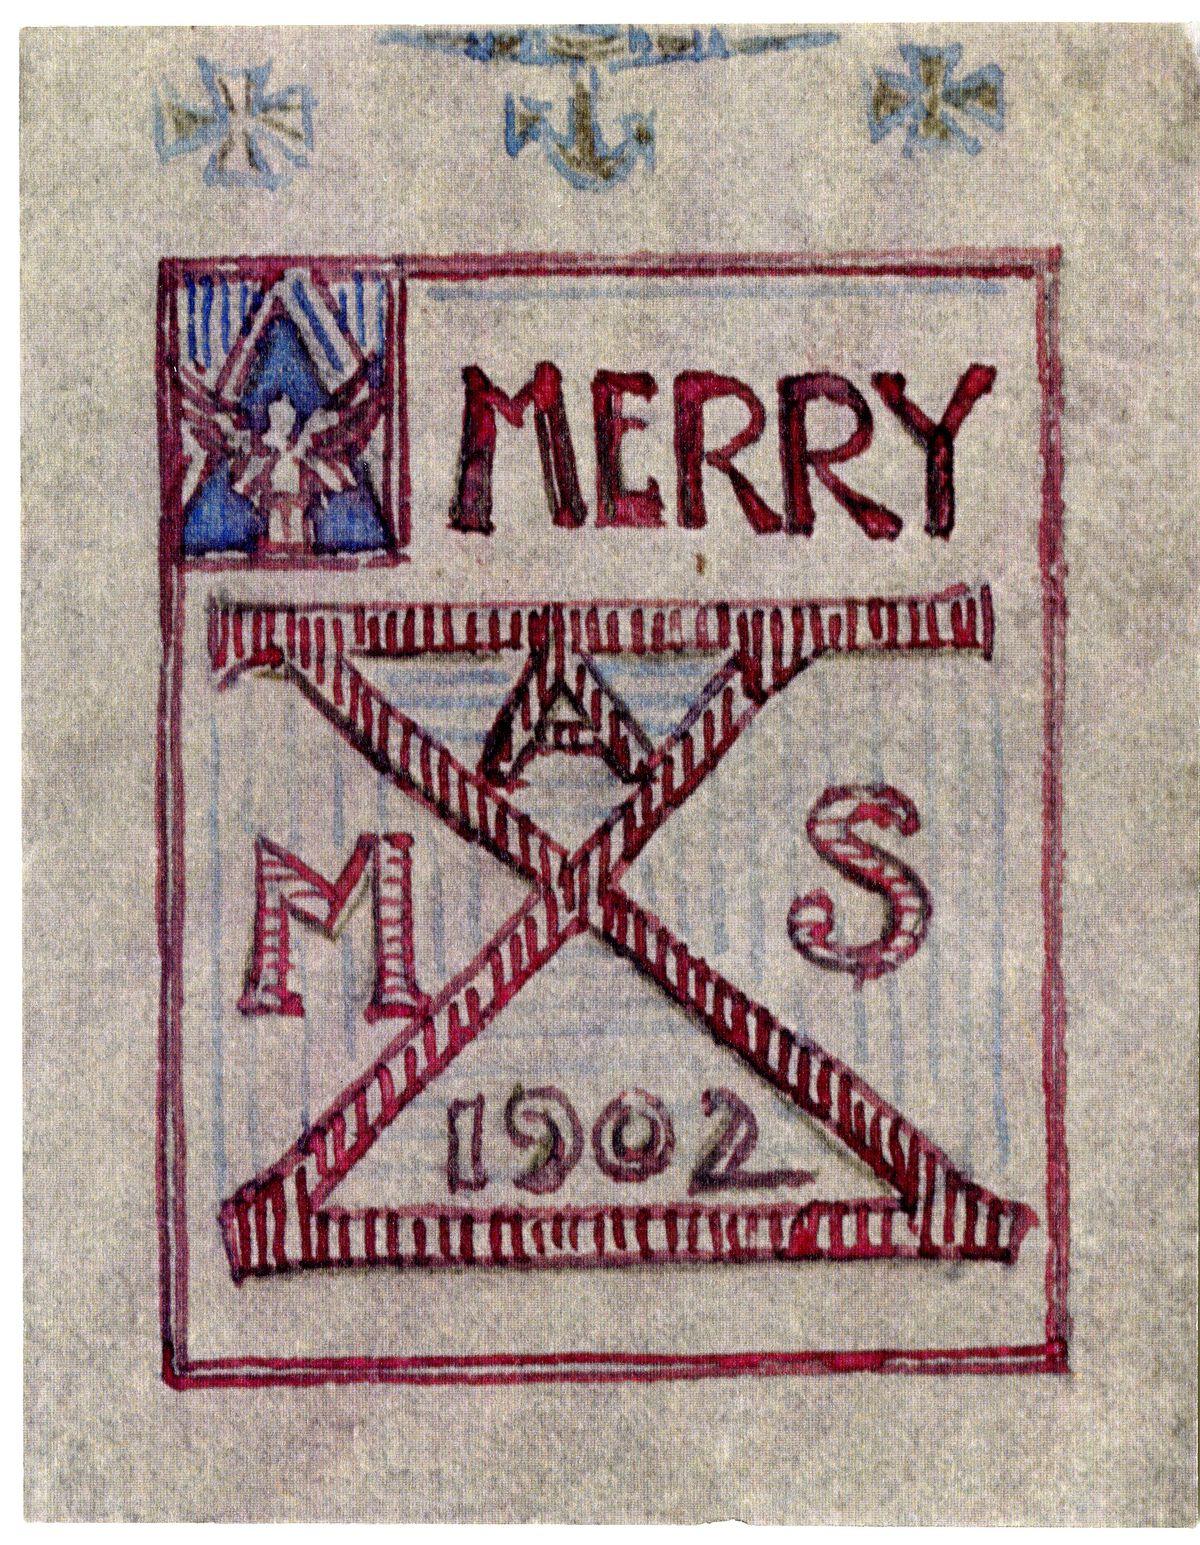 A hand-drawn Christmas card by Bernard Maybeck reads: Merry Xmas 1902.